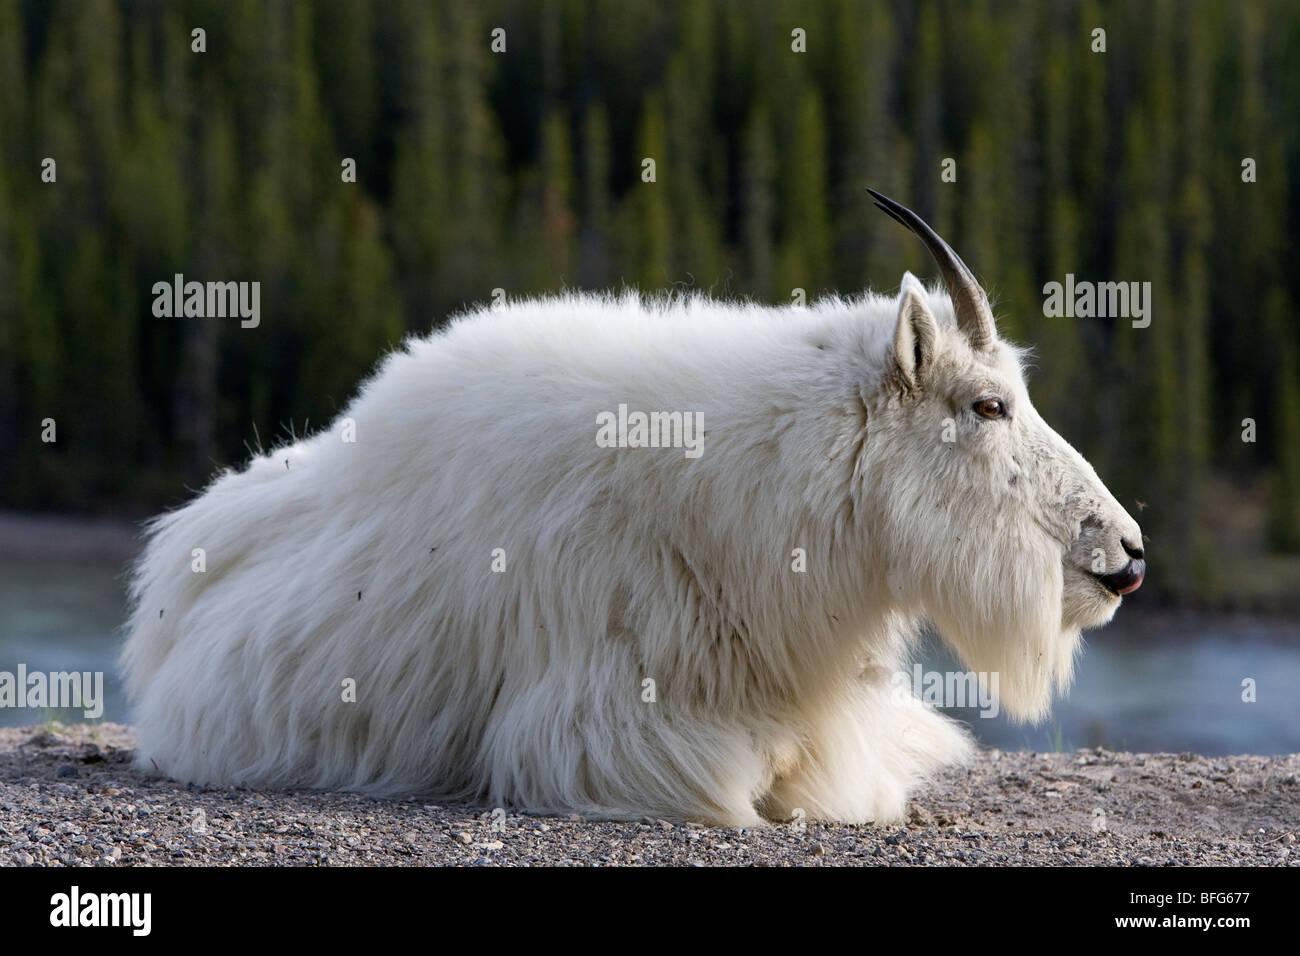 Mountain goat (Oreamnos americanus), licking nose, Jasper National Park, Alberta, Canada. - Stock Image